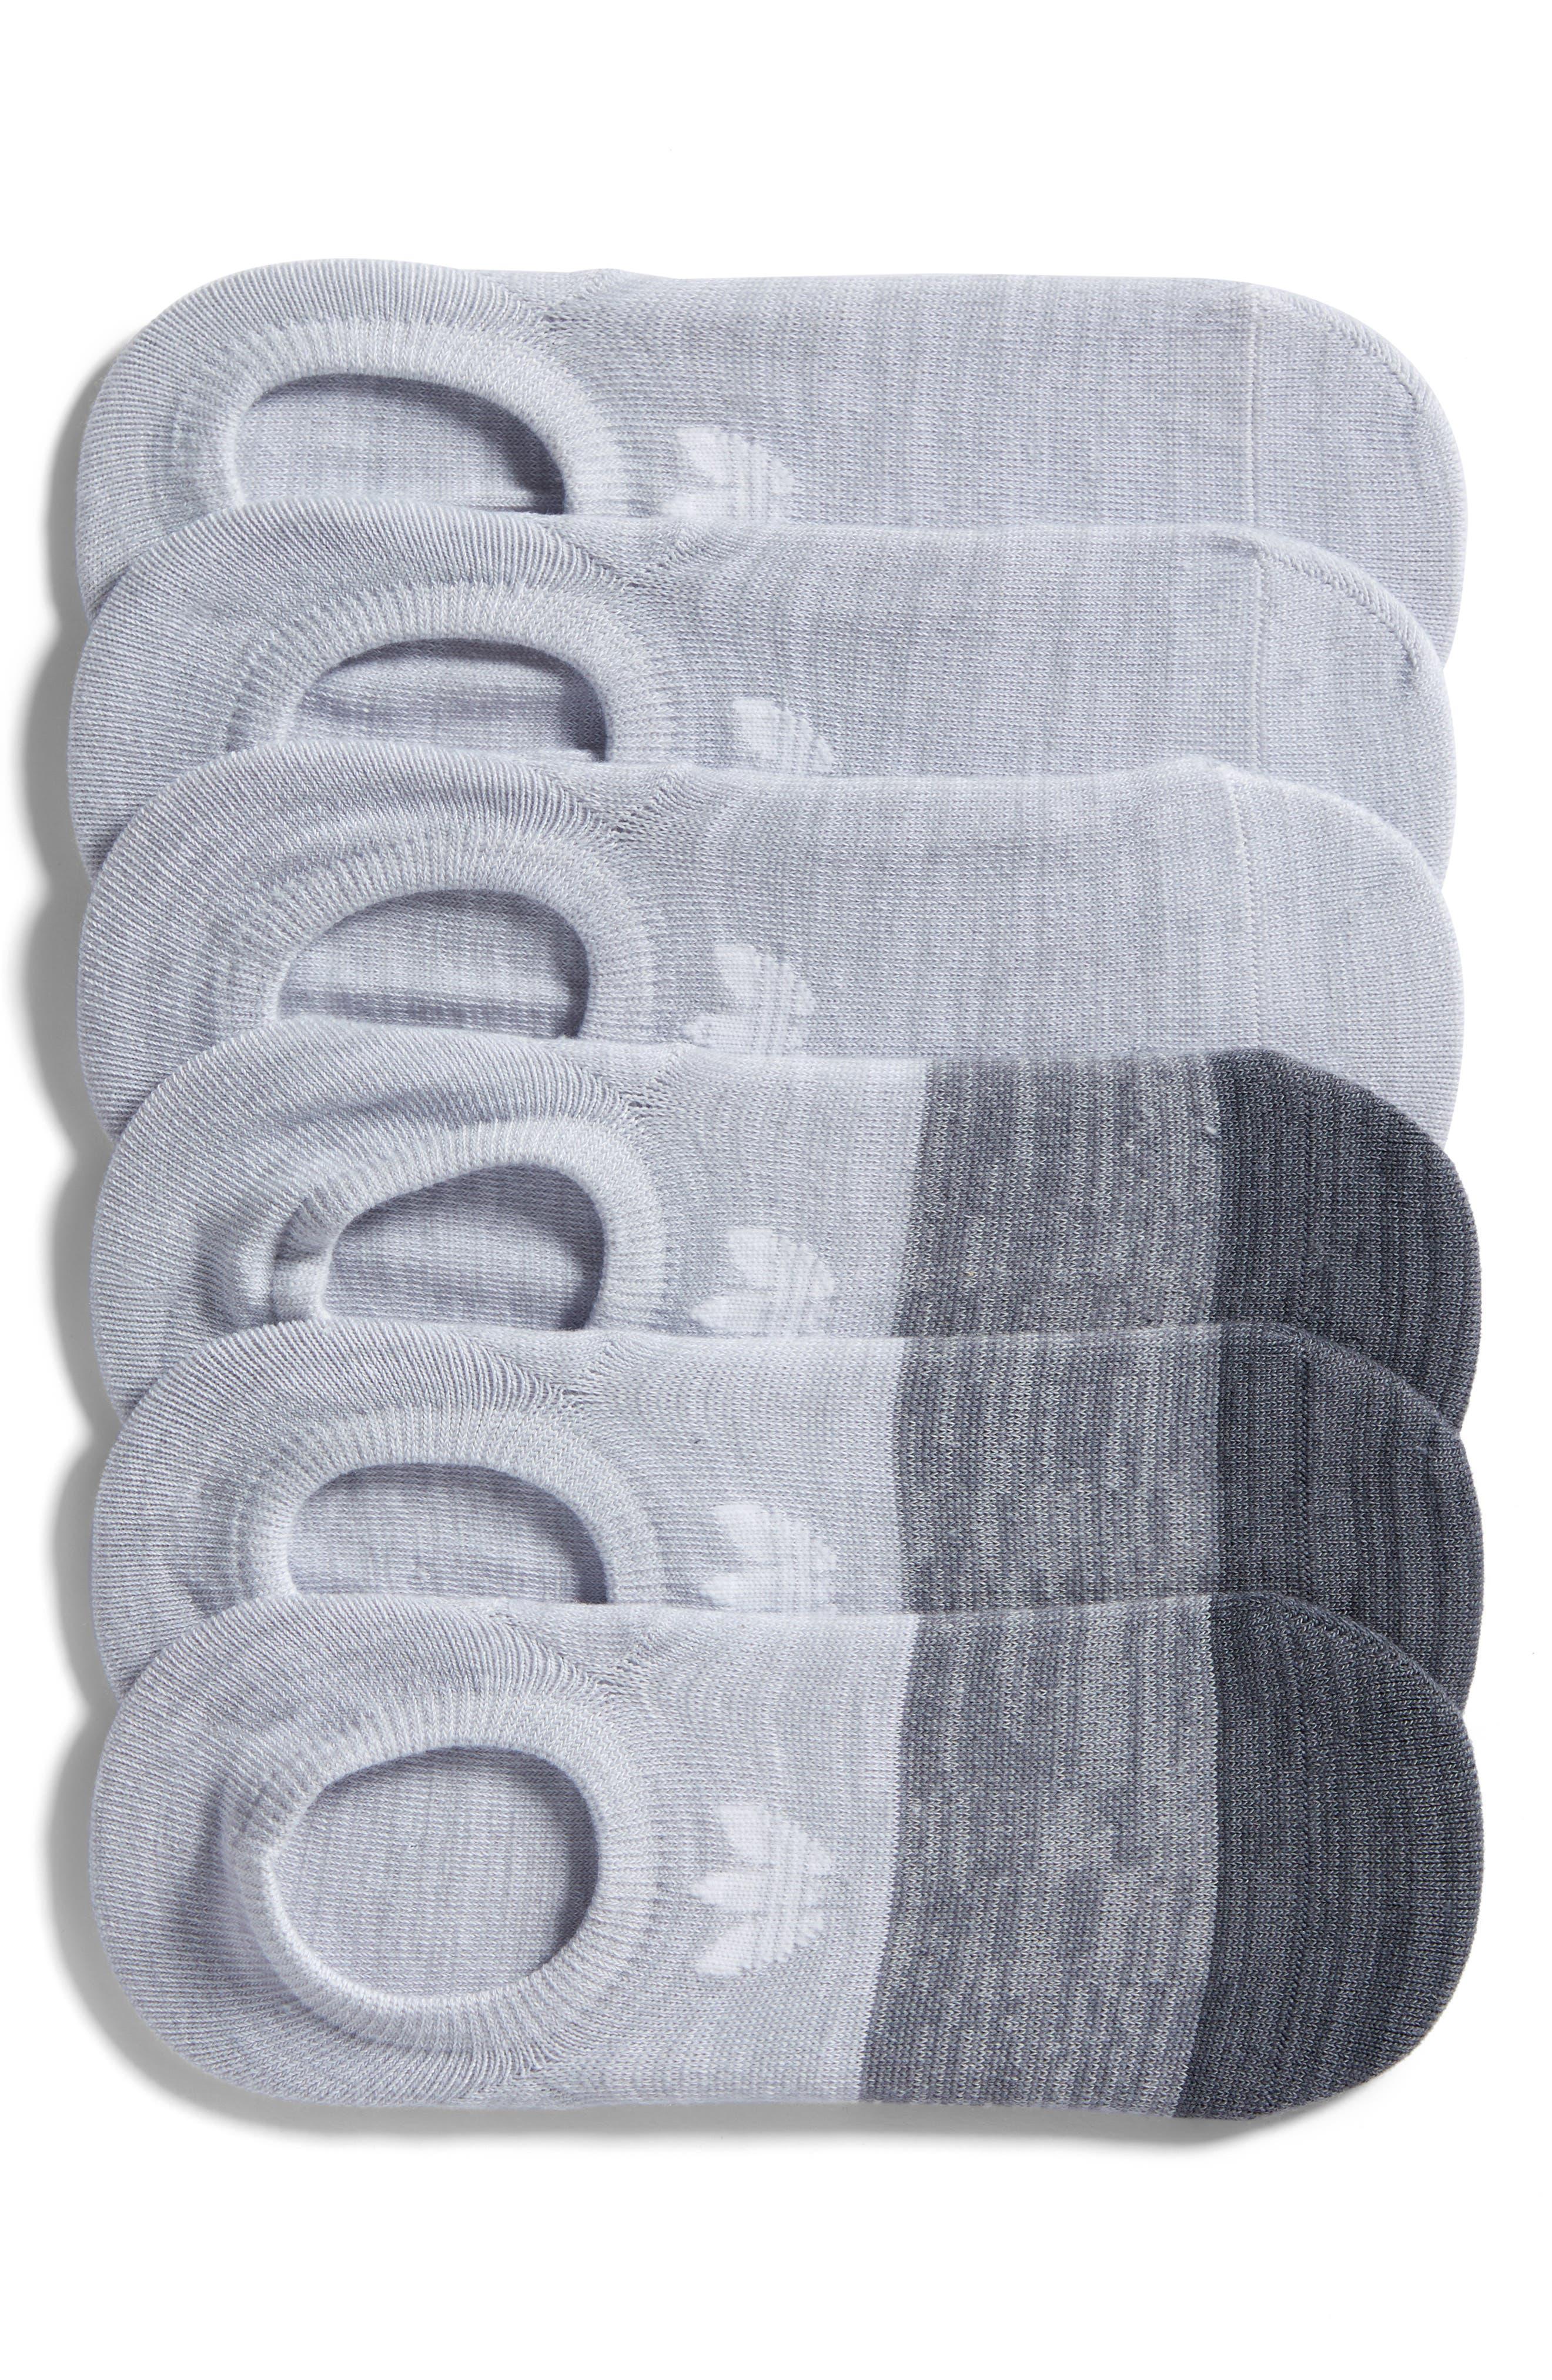 Block Space Dye 6-Pack Super No-Show Socks,                             Main thumbnail 1, color,                             020